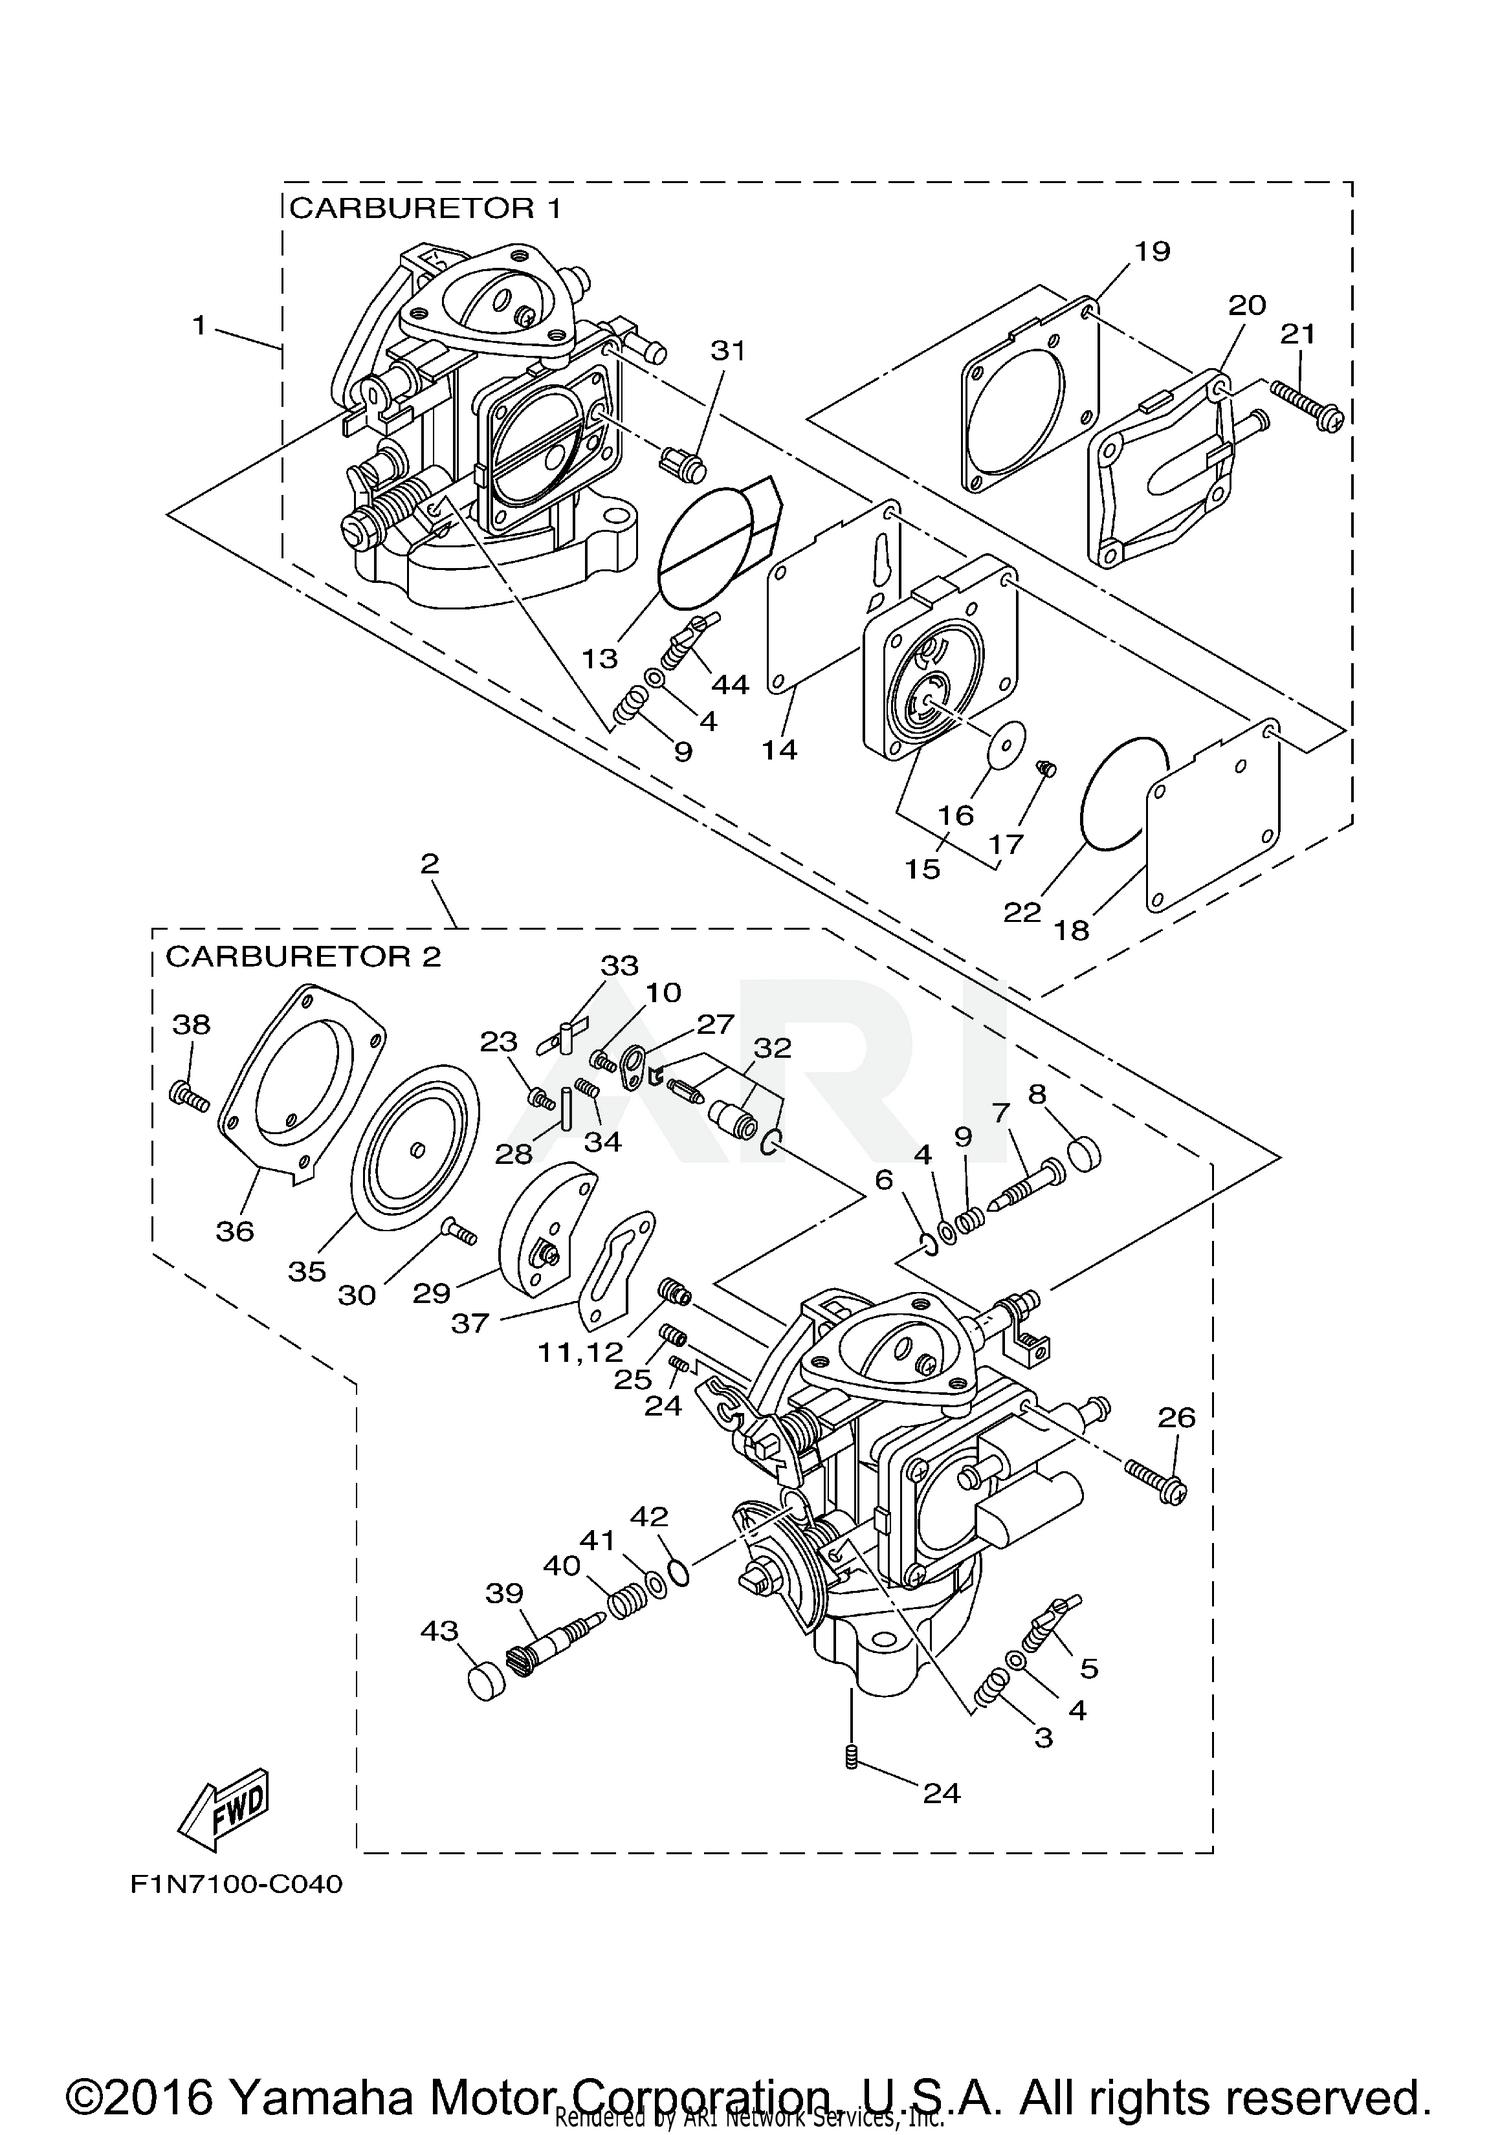 2017 yamaha super jet sj700bs carburetor parts best Parts of a Sailboat schematic search results parts in schematics